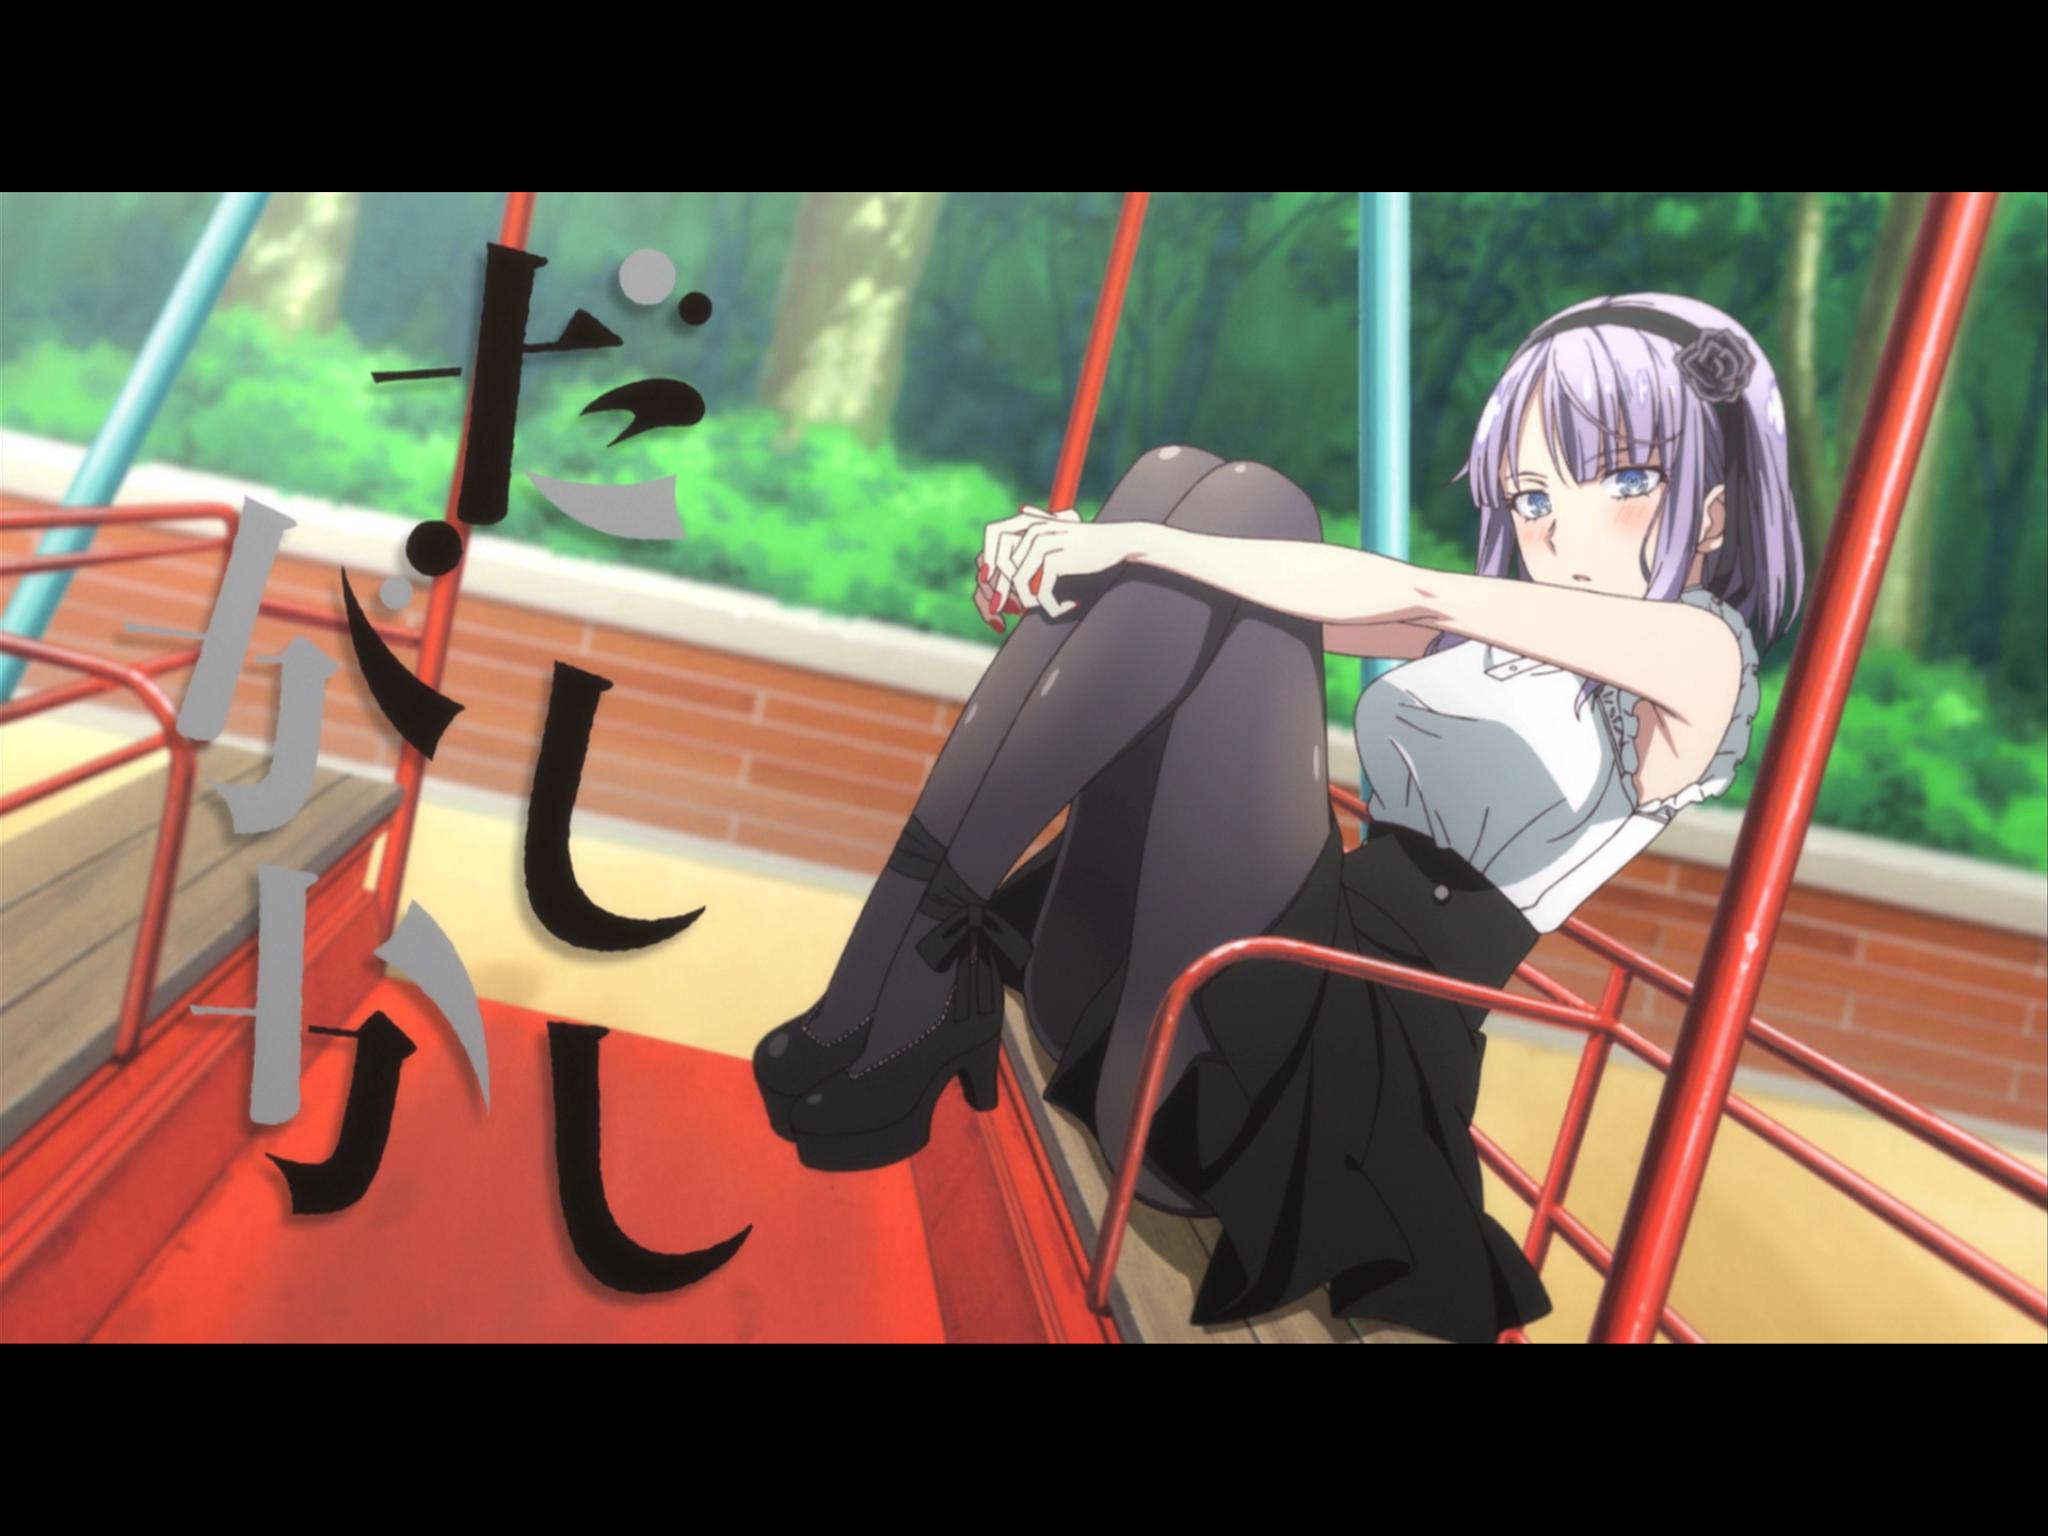 Pin By Pattonkesselring On Dagashi Kashi Anime Summer Anime Anime Heaven